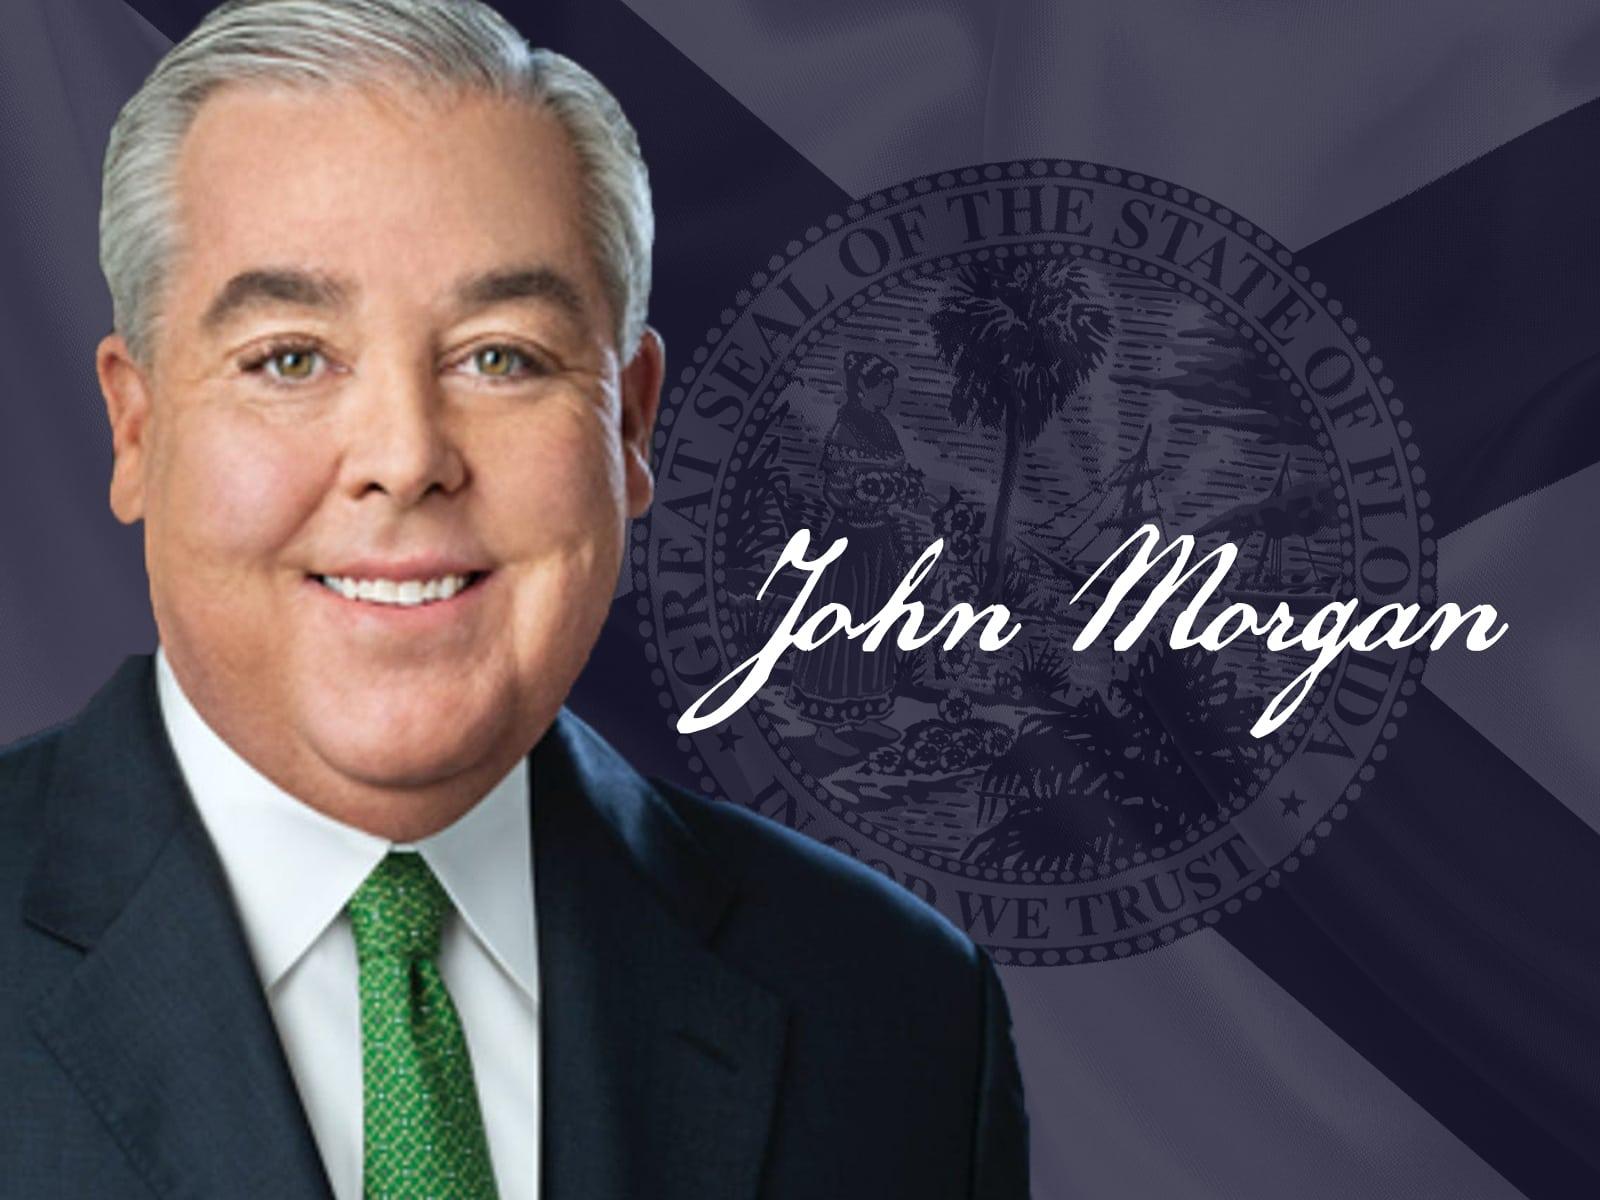 POTD_John-Morgan.jpg